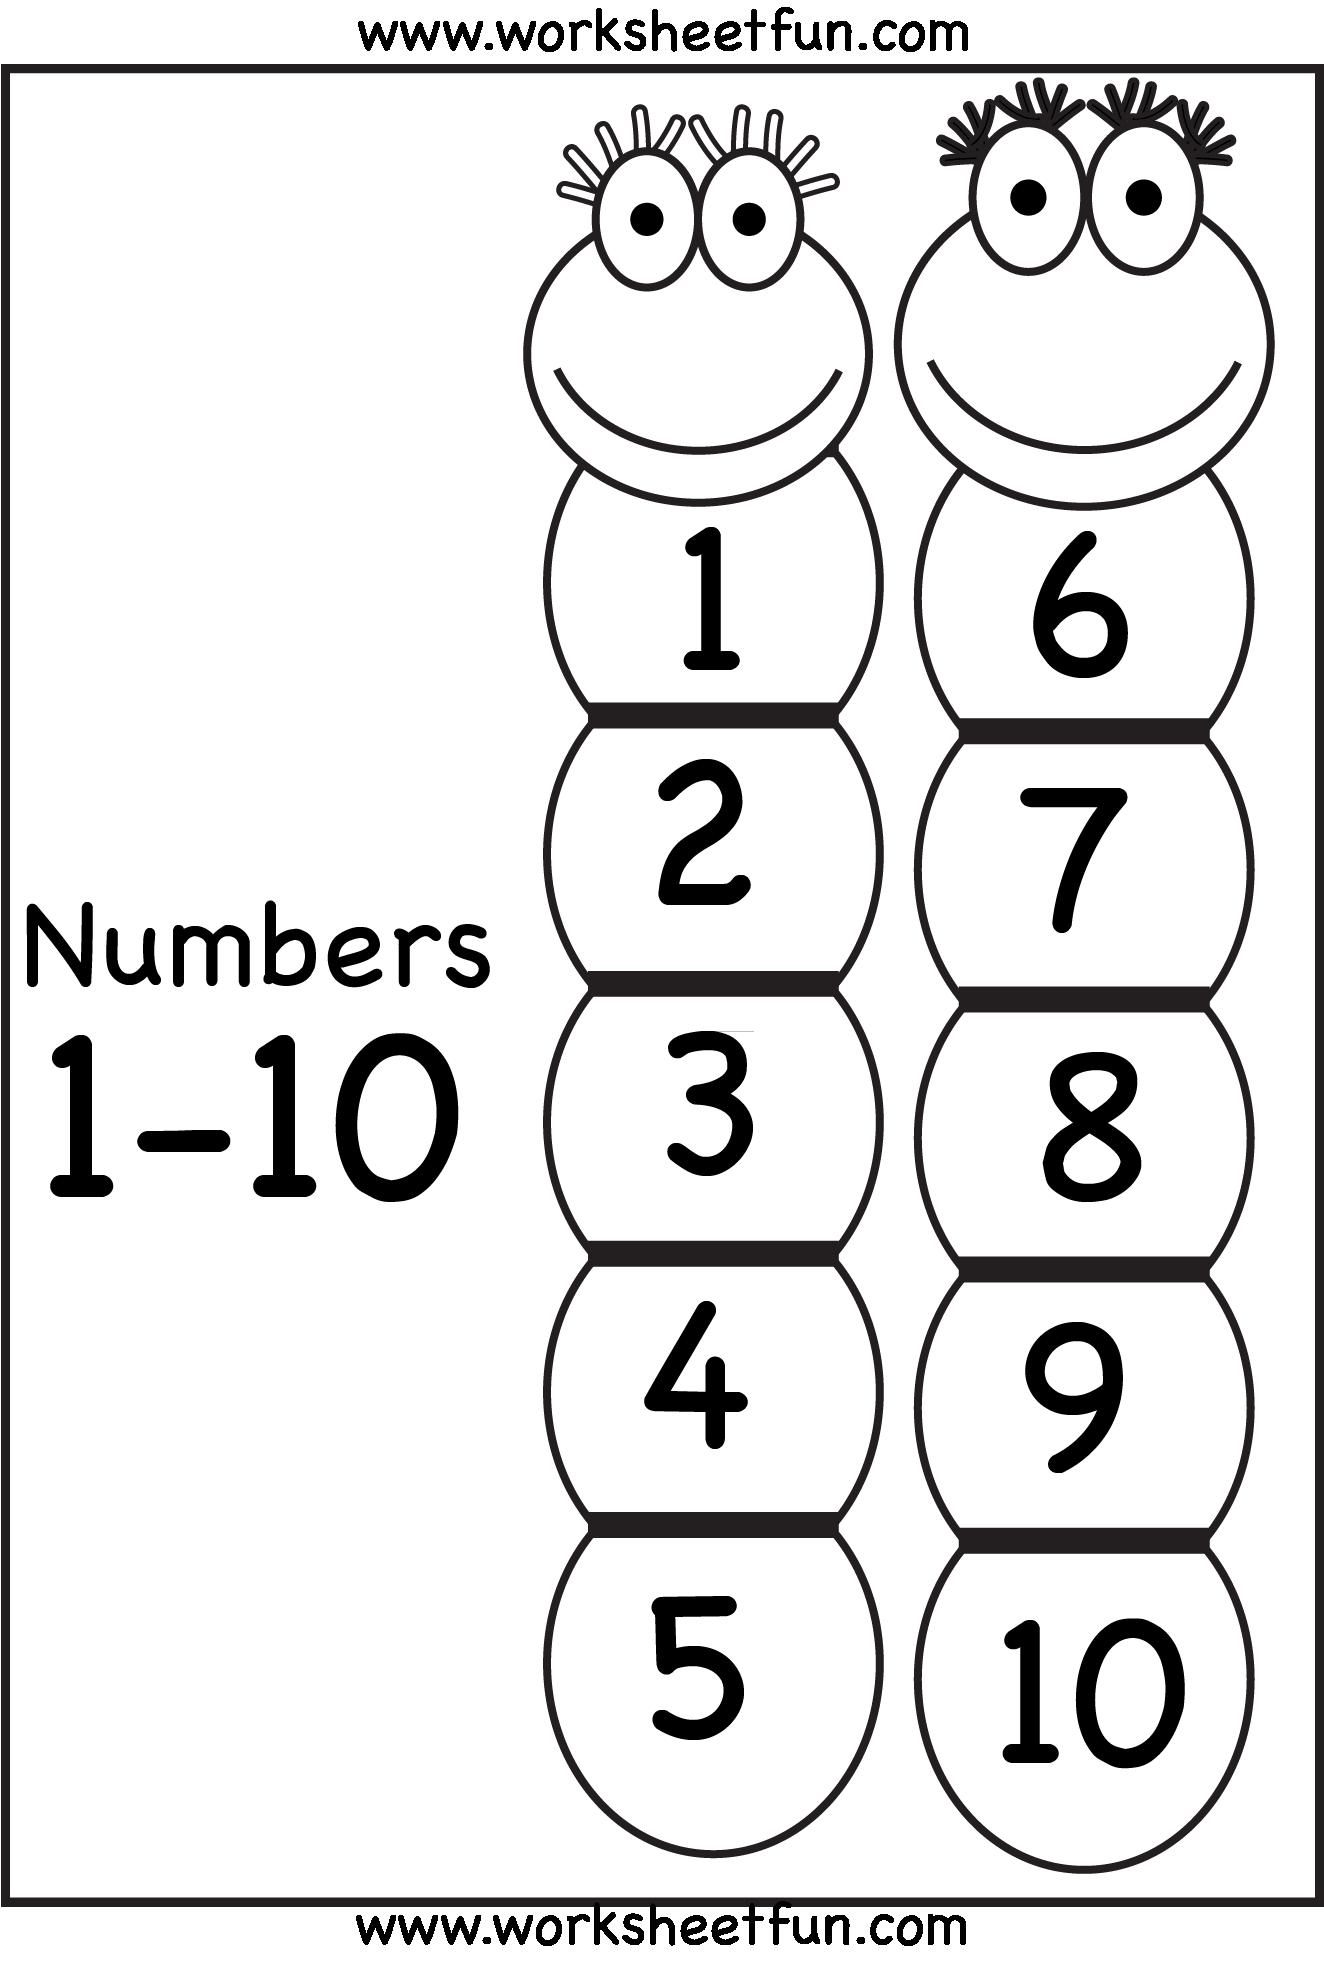 Number Tracing Dinosaurs preschool, Free preschool